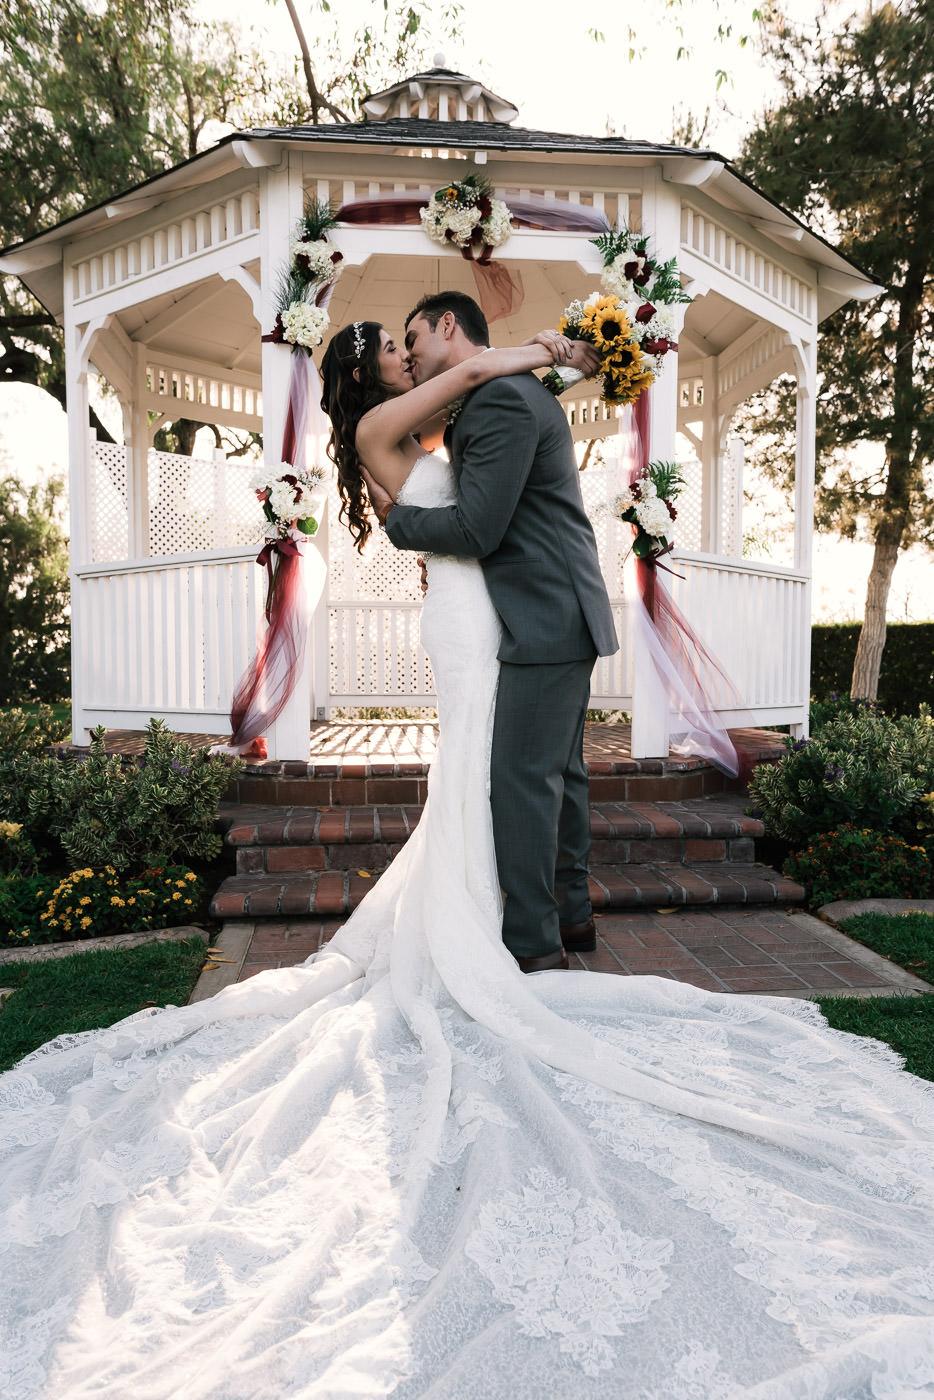 Placentia wedding photographer captures a romantic kiss at the Alta Vista Country Club.